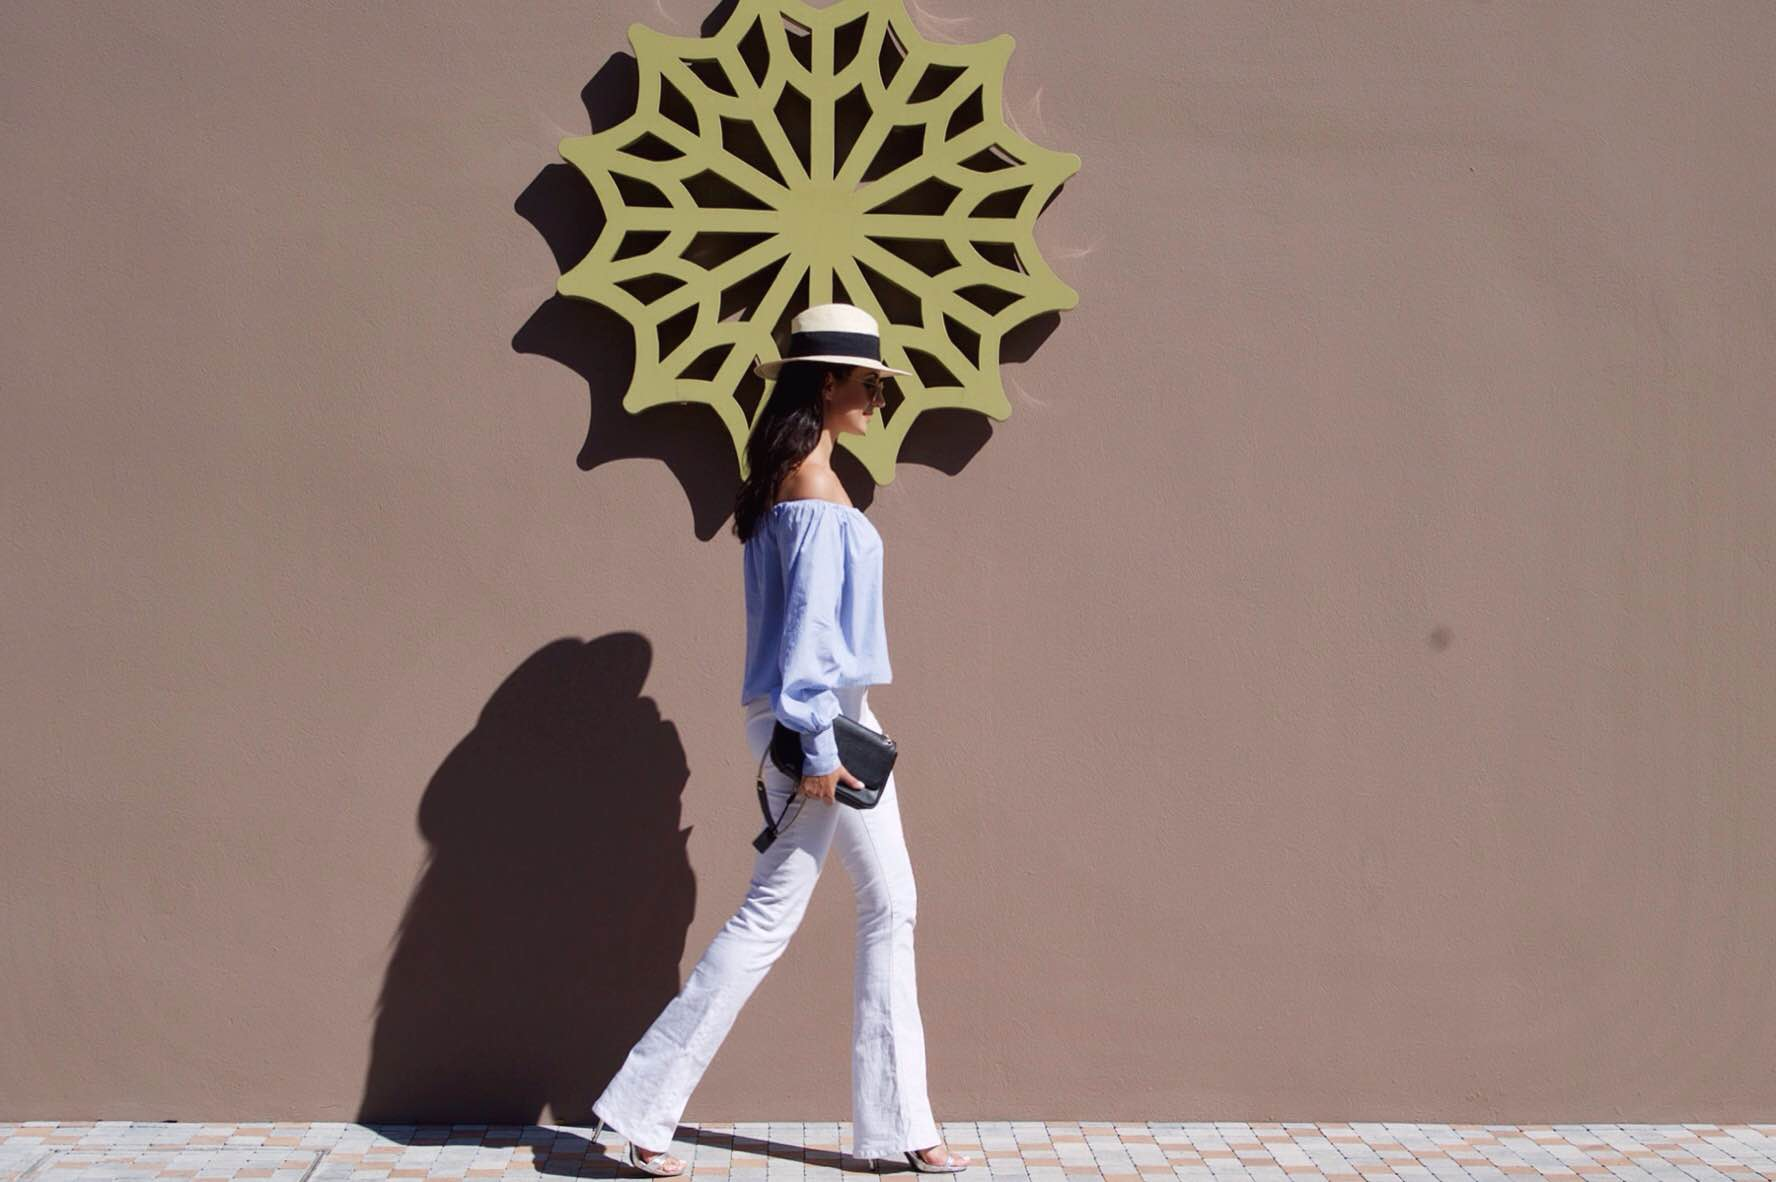 02-Tiara-Miramar-Beach-Hotel-Spa-Cote-dAzur-Yllka-Brada-Collaboration-Disi-Couture